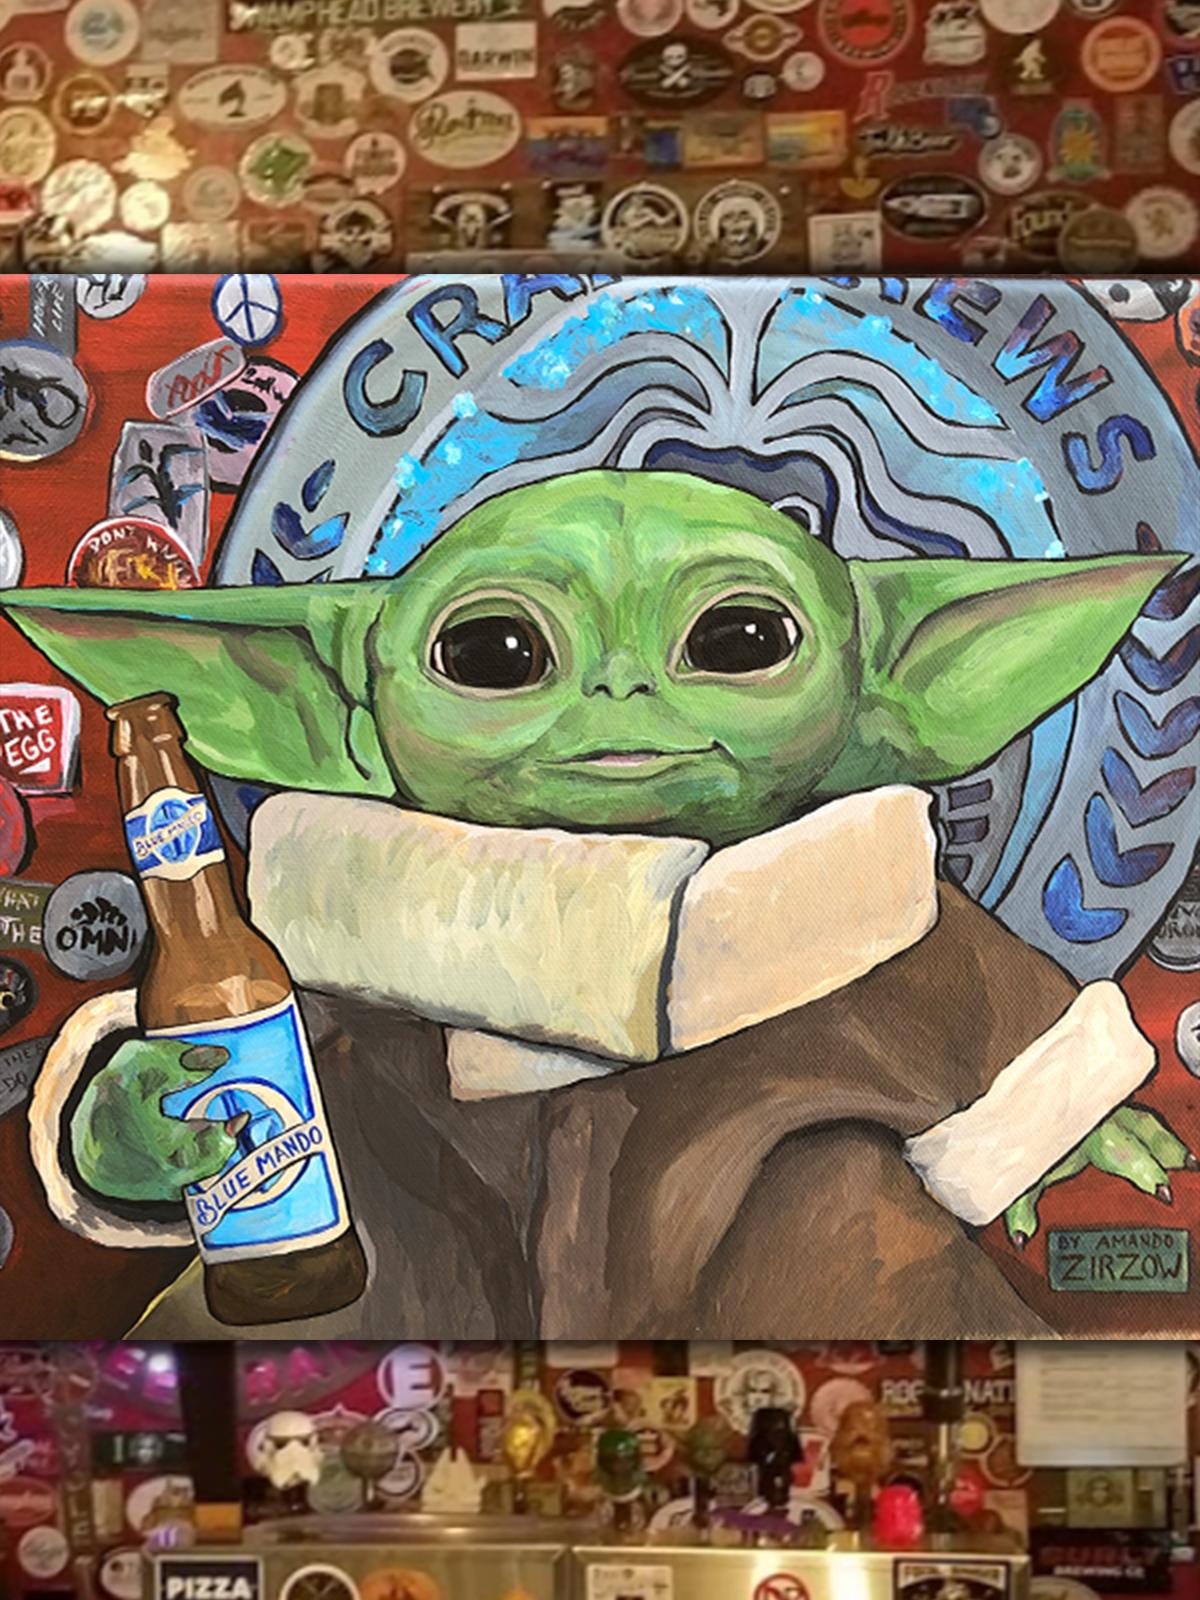 Amanda Zirzow Blue Mando No. 3 Craft Beer